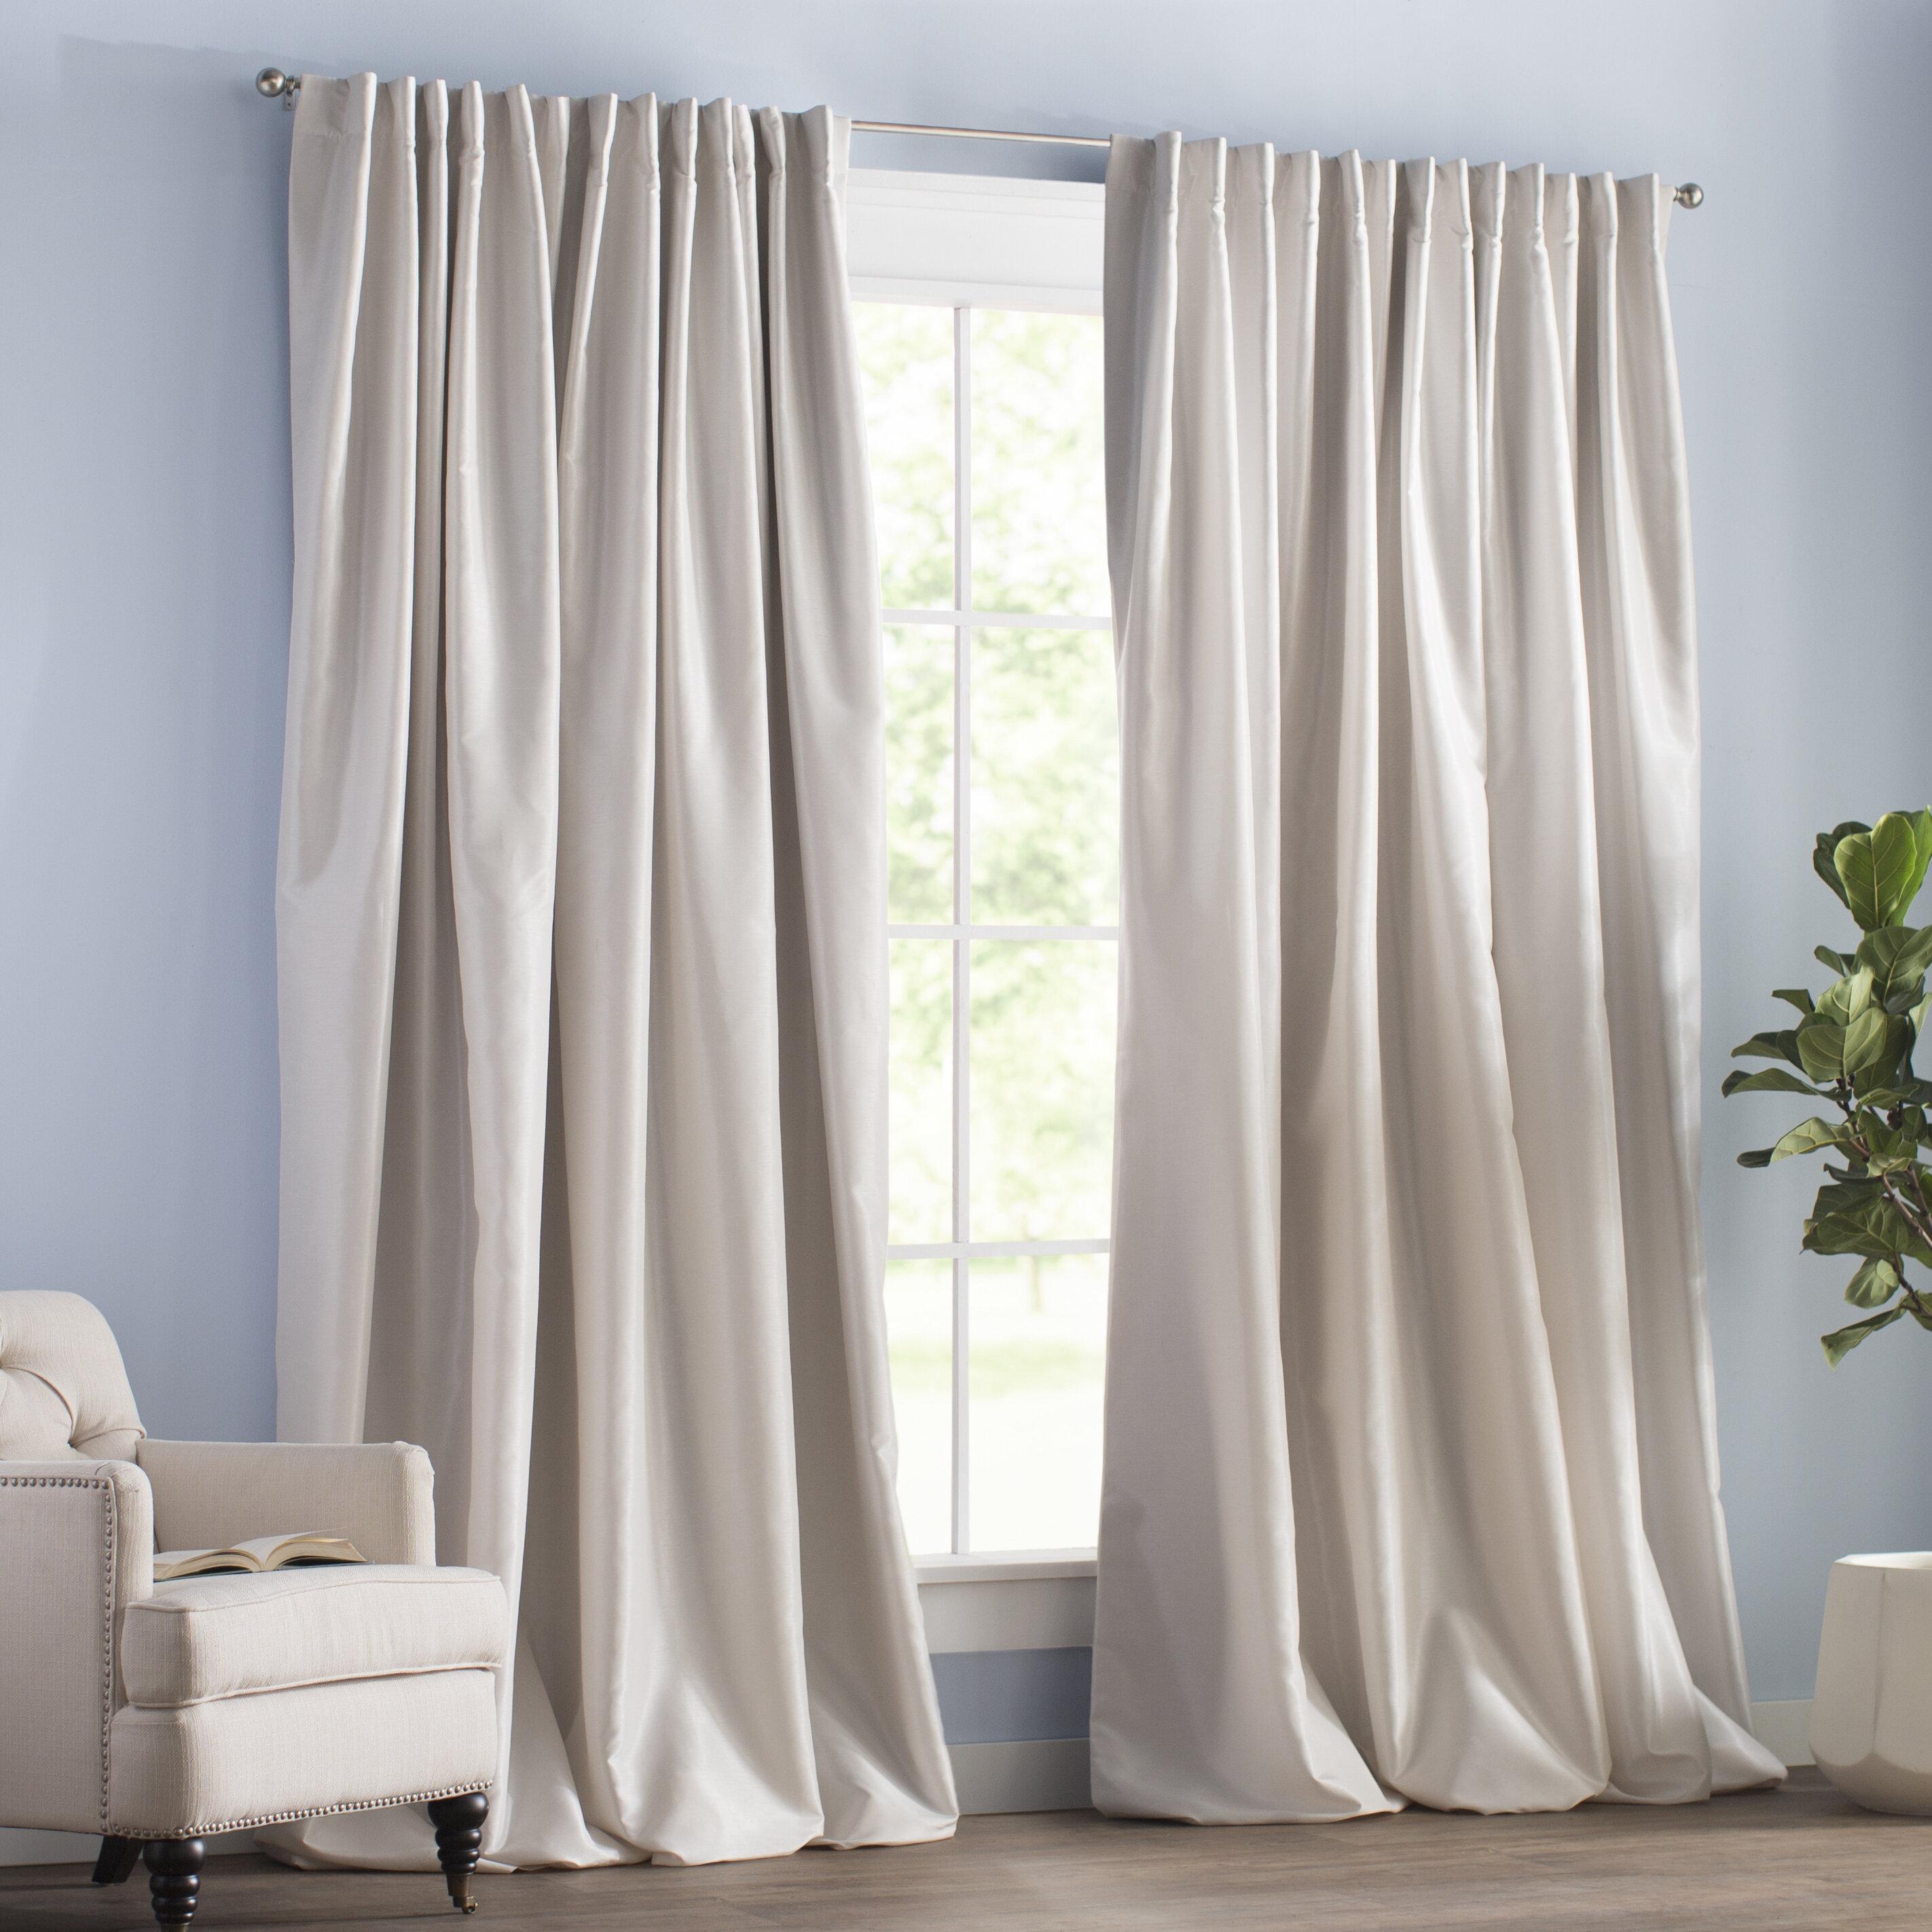 Blackout Rod Pocket Curtain Panels Inside Thermal Rod Pocket Blackout Curtain Panel Pairs (View 11 of 30)